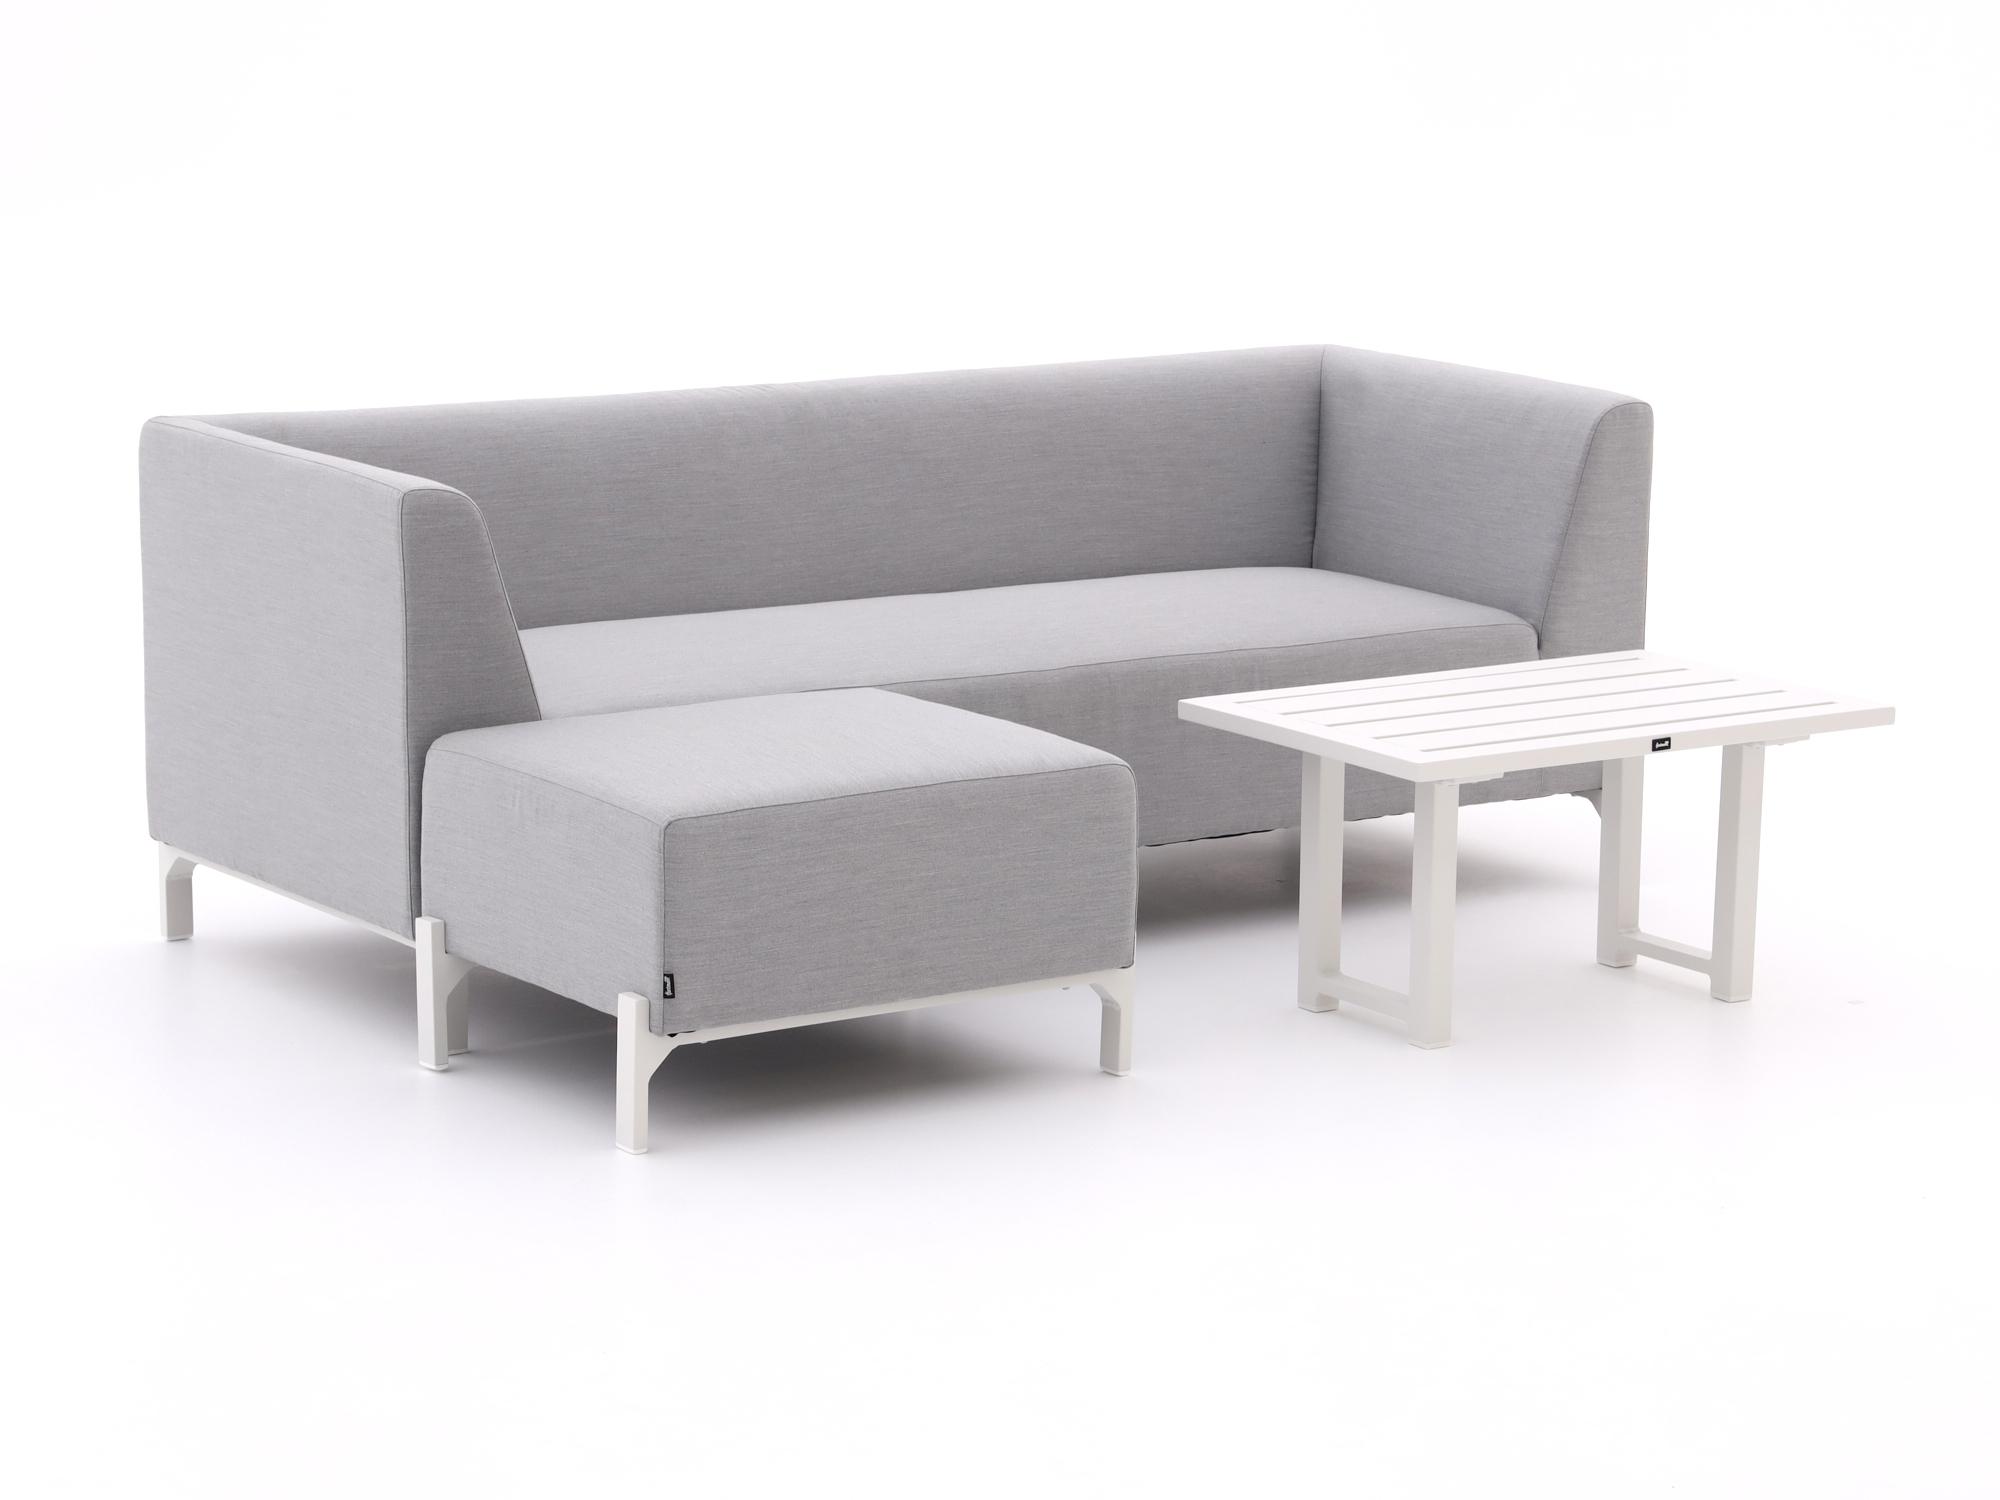 Hartman Dion chaise longue loungeset 3-delig - Laagste prijsgarantie!